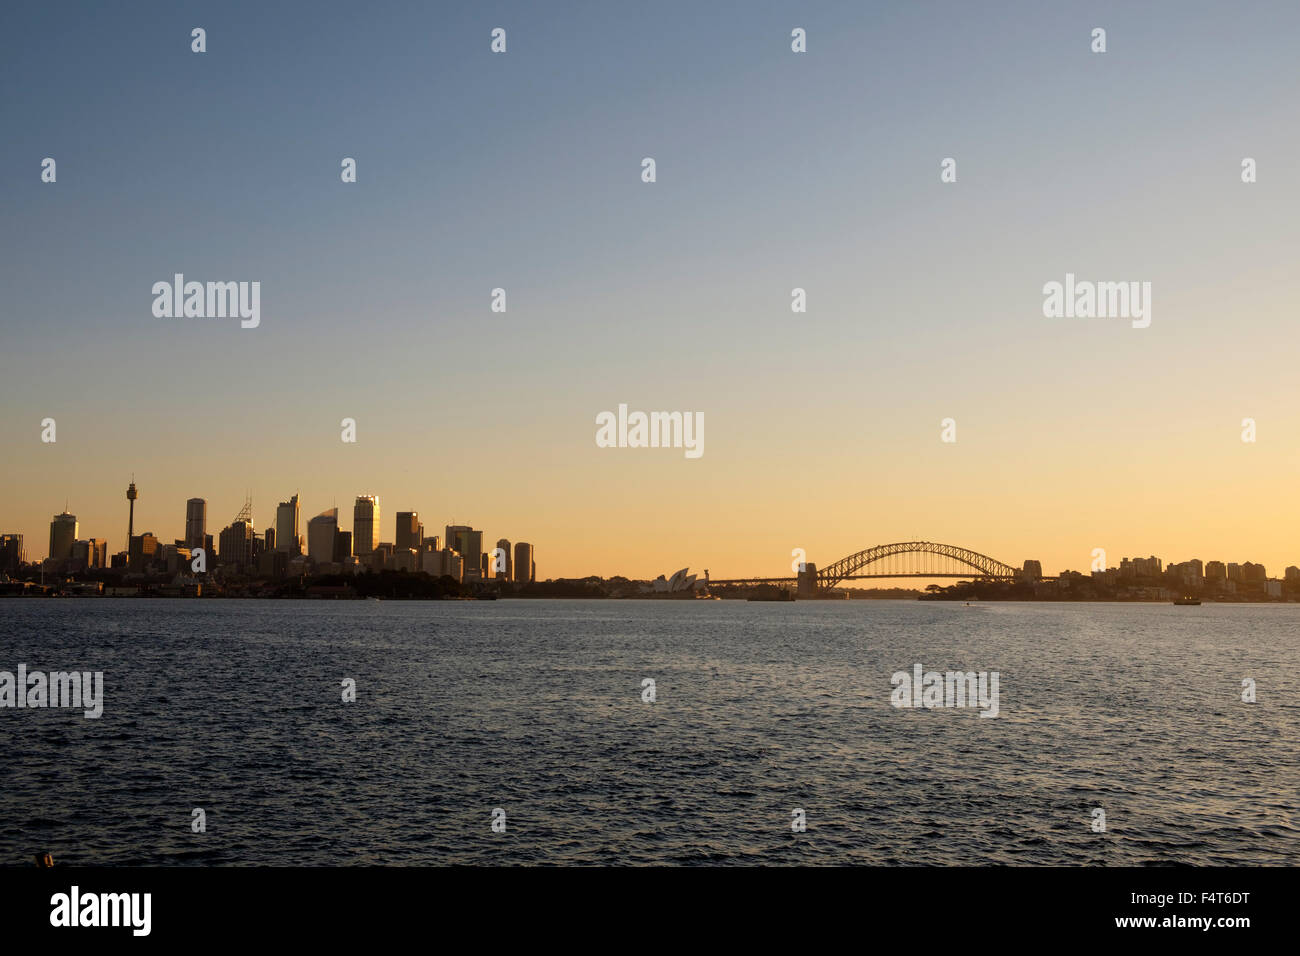 data keluaran sydney 2018 sampai 2019